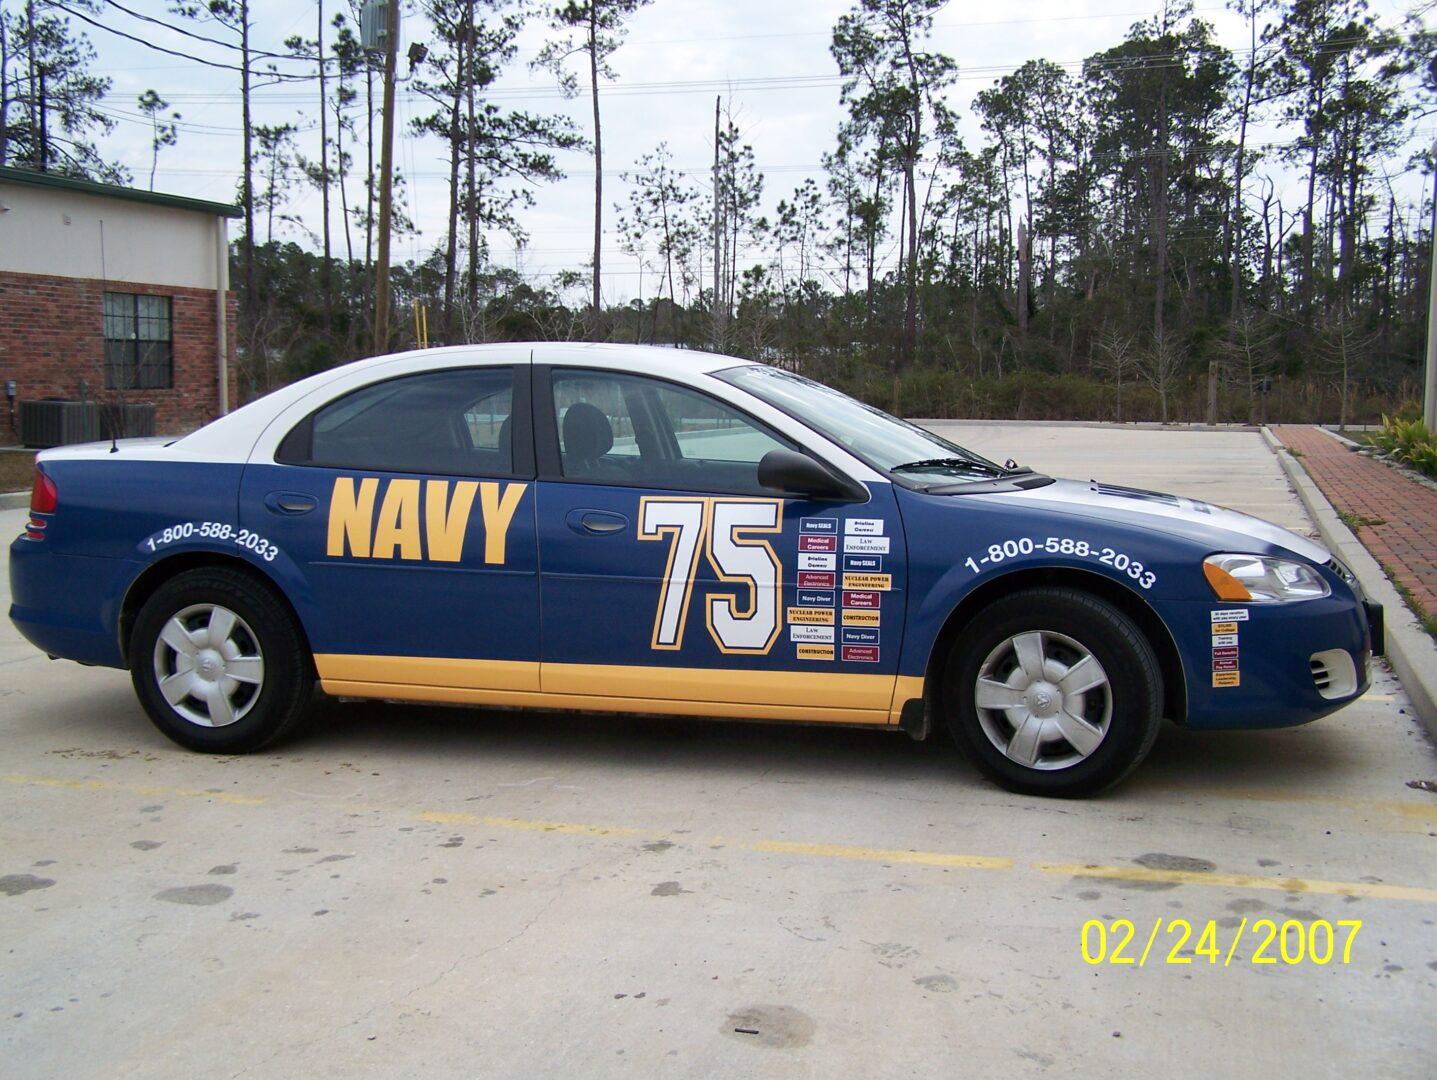 Fleet Graphics Slidell, LA Trailer Wraps SEI HQ Navy 75